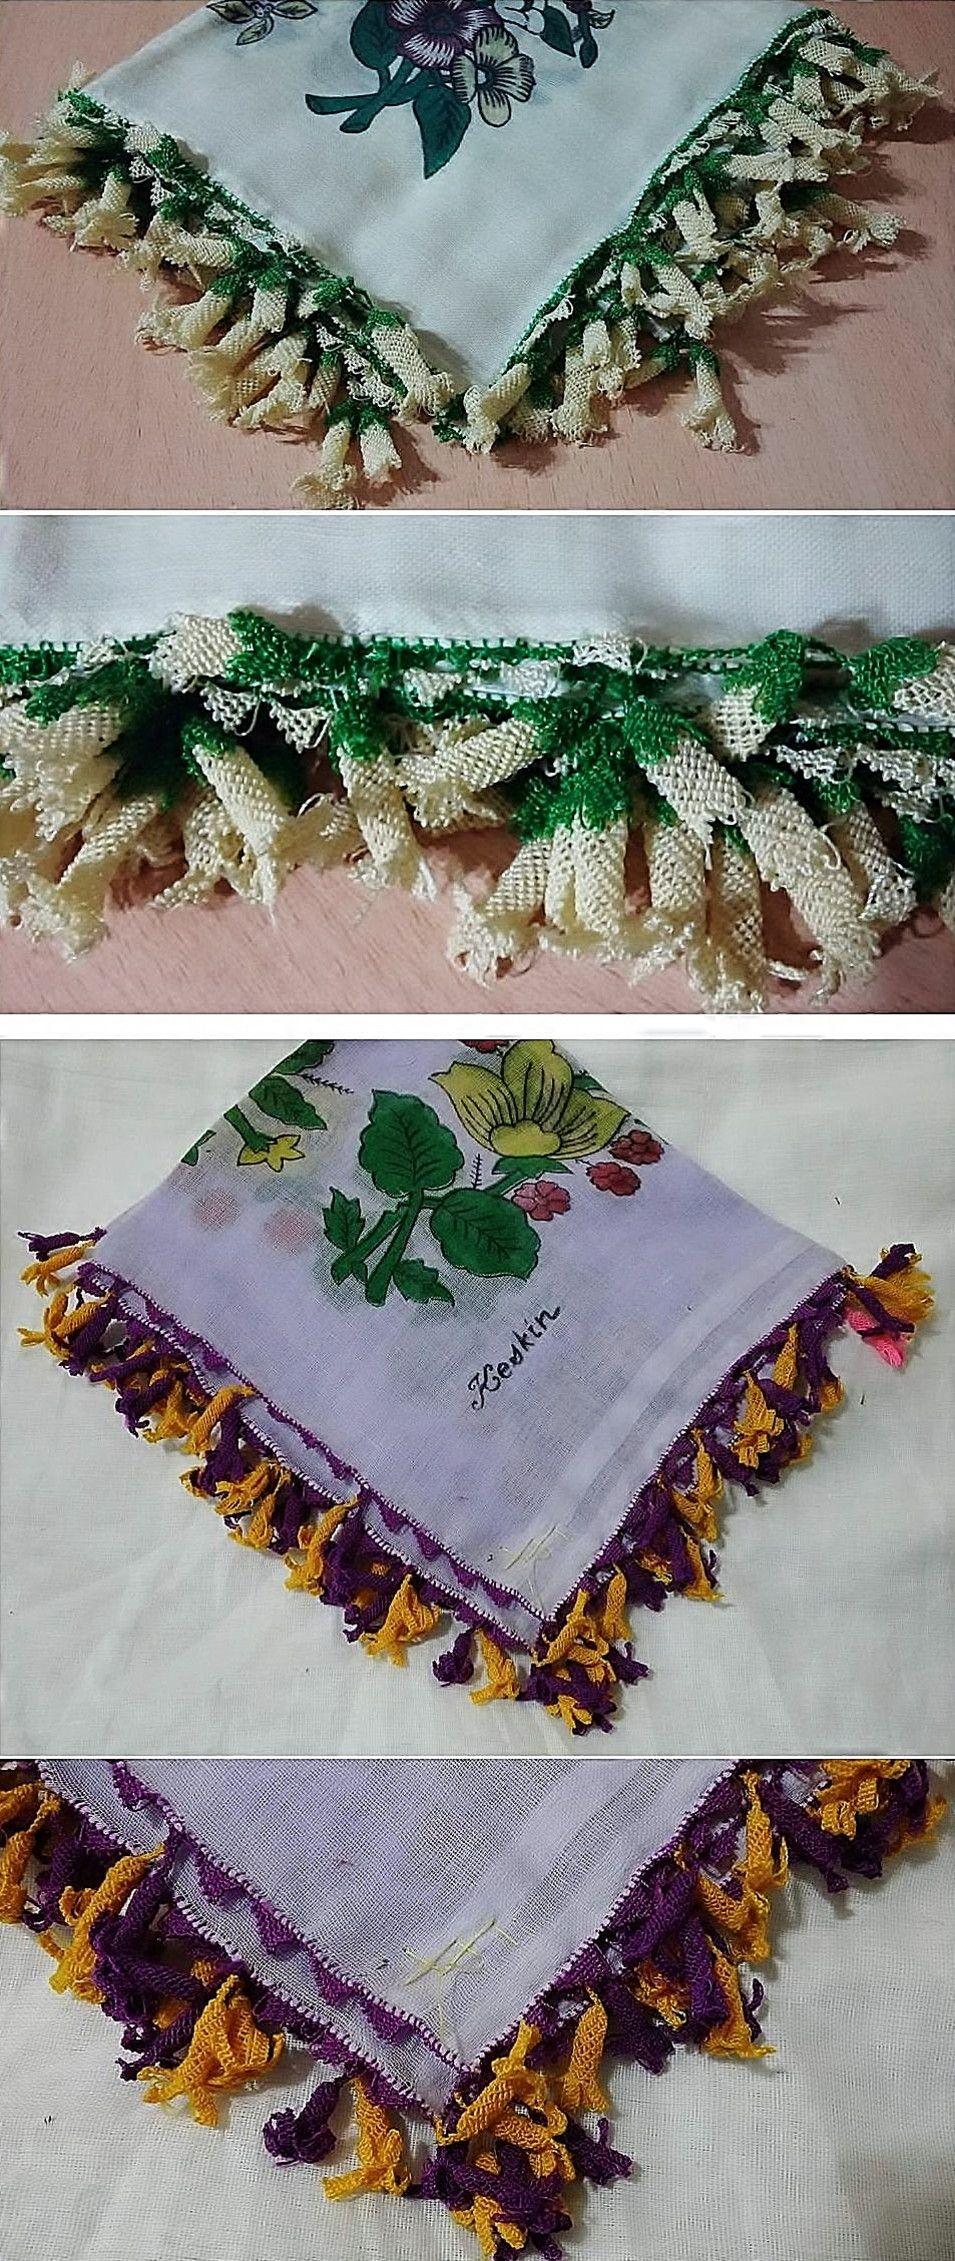 Two 'oyalı yazma' - (printed cotton) headscarves edged with Turkish lace. From Kozak Yaylası, near Bergama. From newcomers, ca. 1950-1975. (Source: Tekin Uludoğan, Balıkesir).